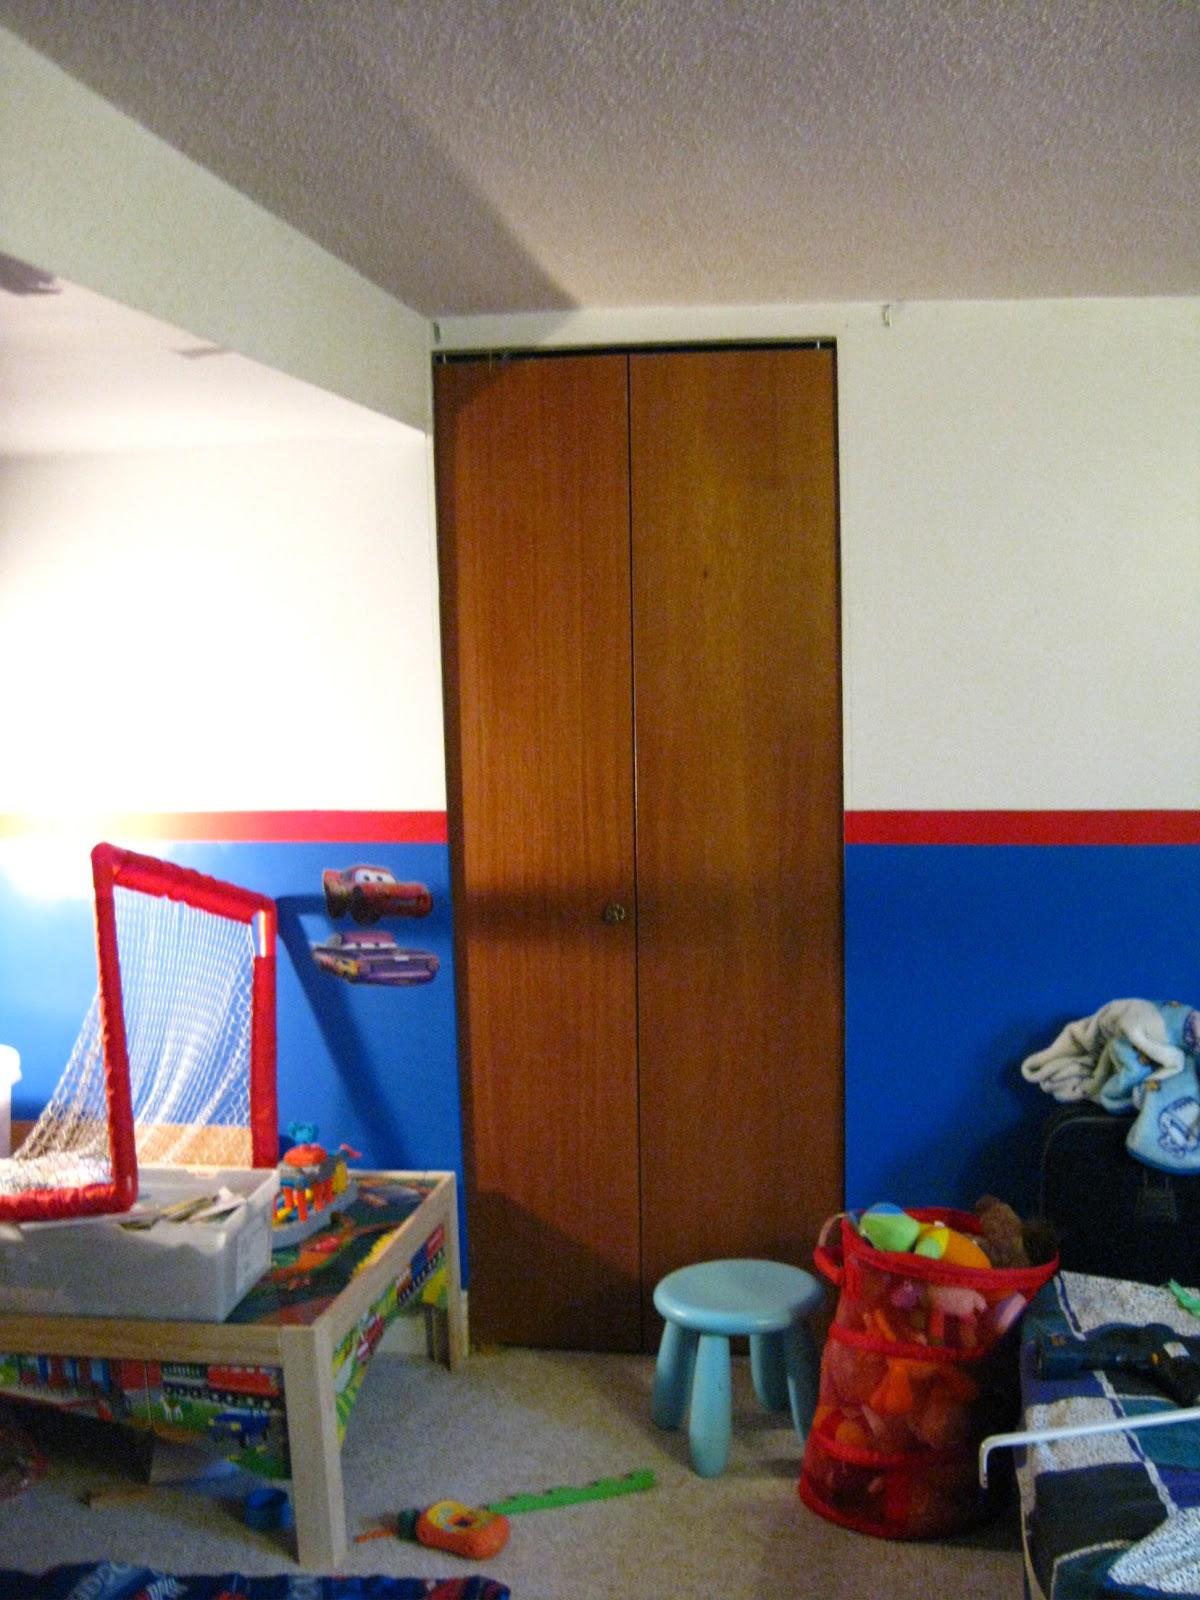 http://4.bp.blogspot.com/-YKitpdg6H6U/UBdiiNH-mFI/AAAAAAAABLY/UqedWCm0zQ8/s1600/Life+Designed+Basement+Stage+1.JPG